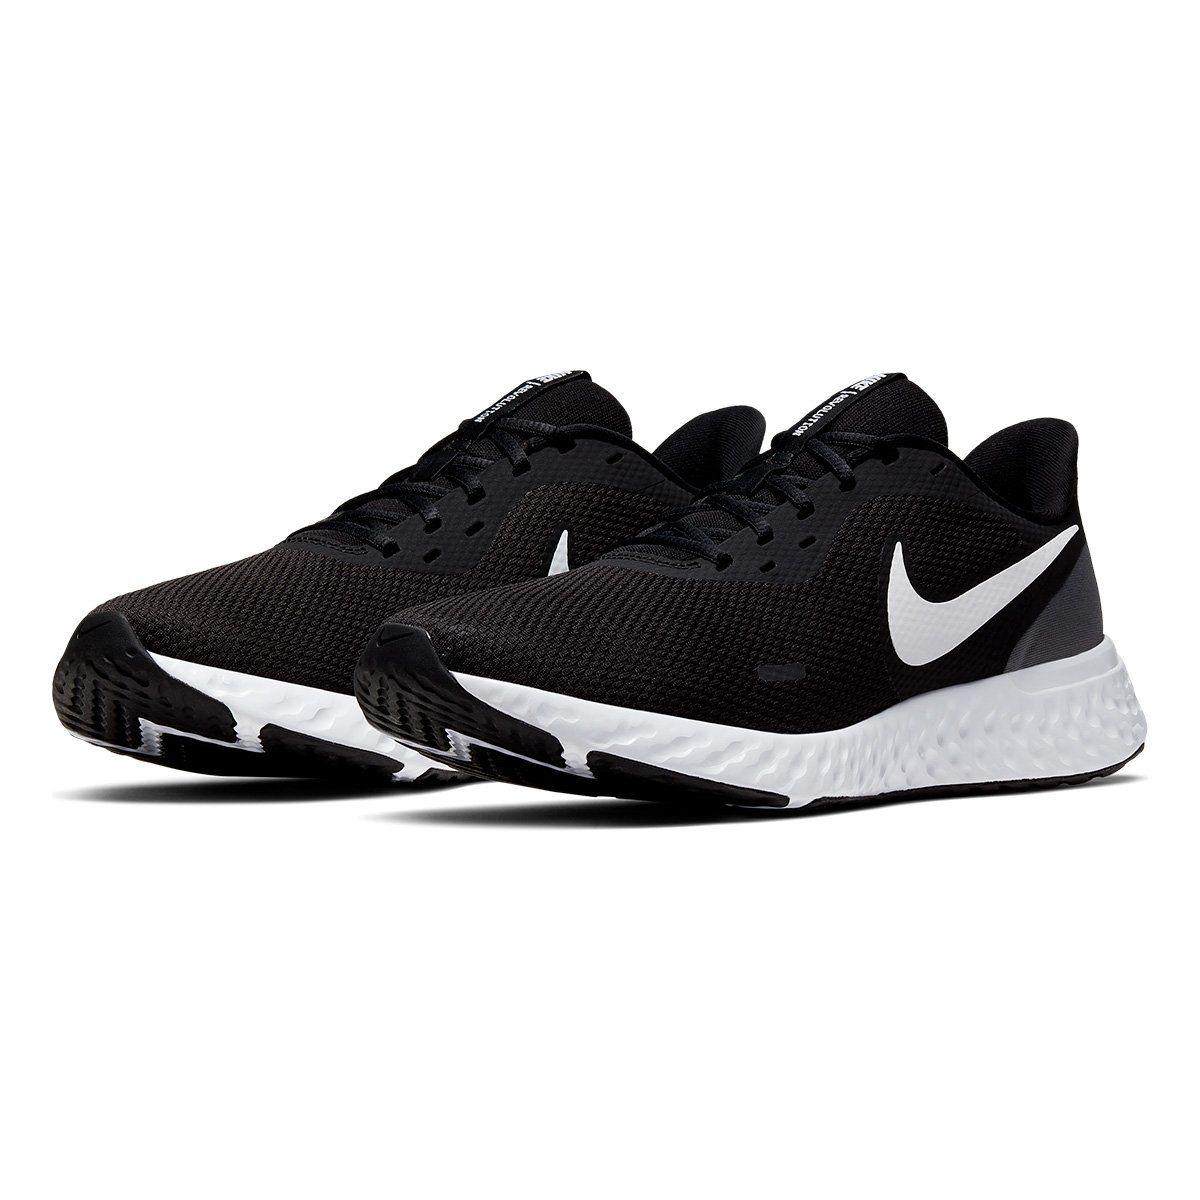 Tênis Nike Revolution 5 Masculino Preto e Branco en 2020